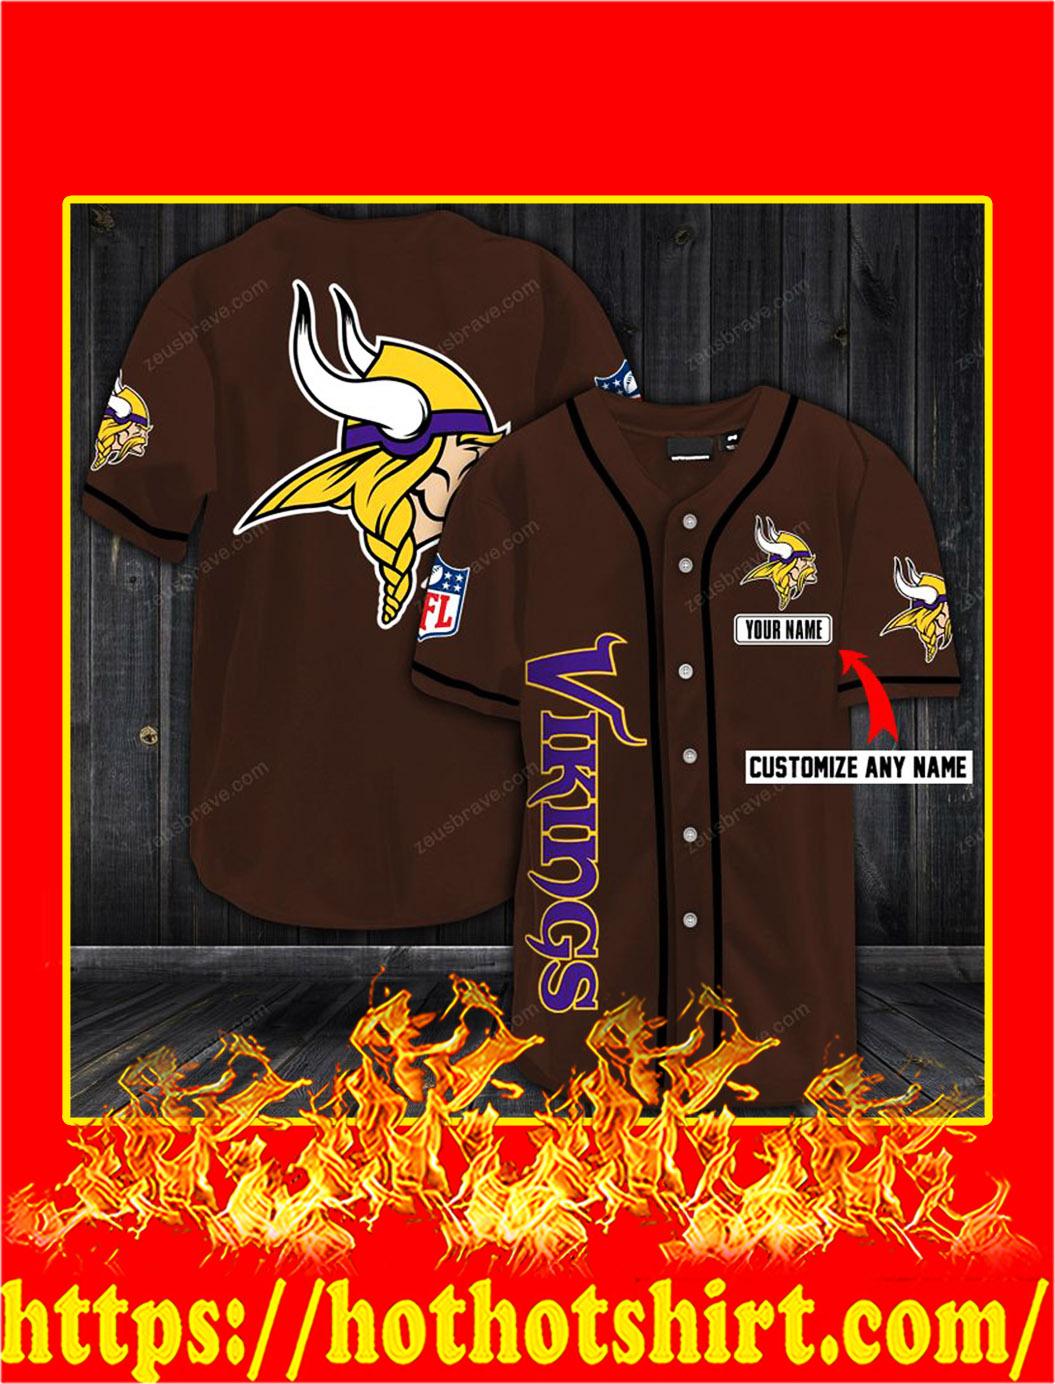 Customize name minnesota vikings hawaiian shirt- brown